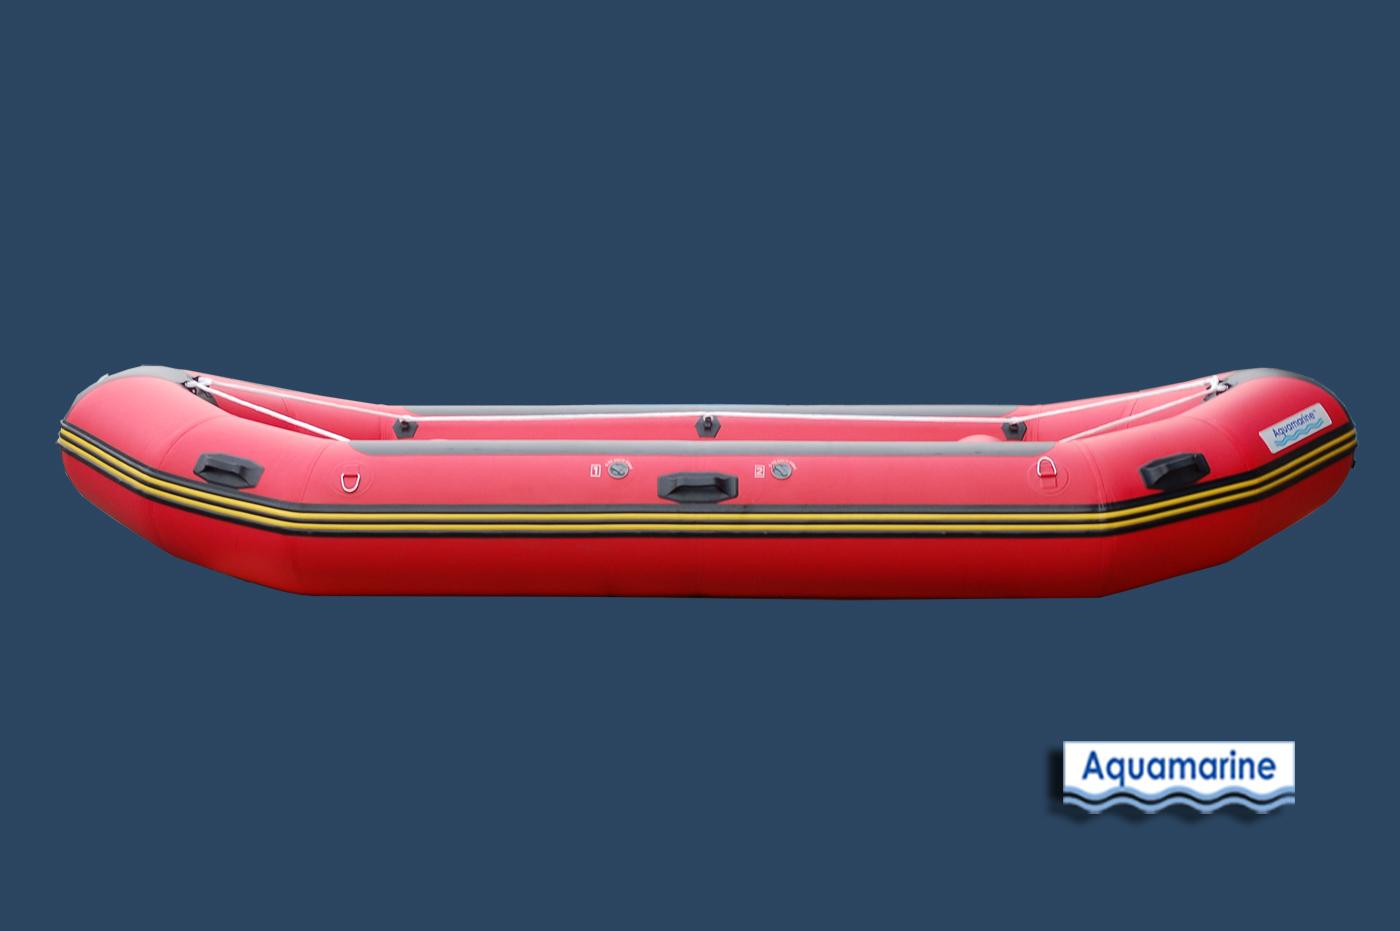 14 Whitewater Inflatable River Raft Aquamarine